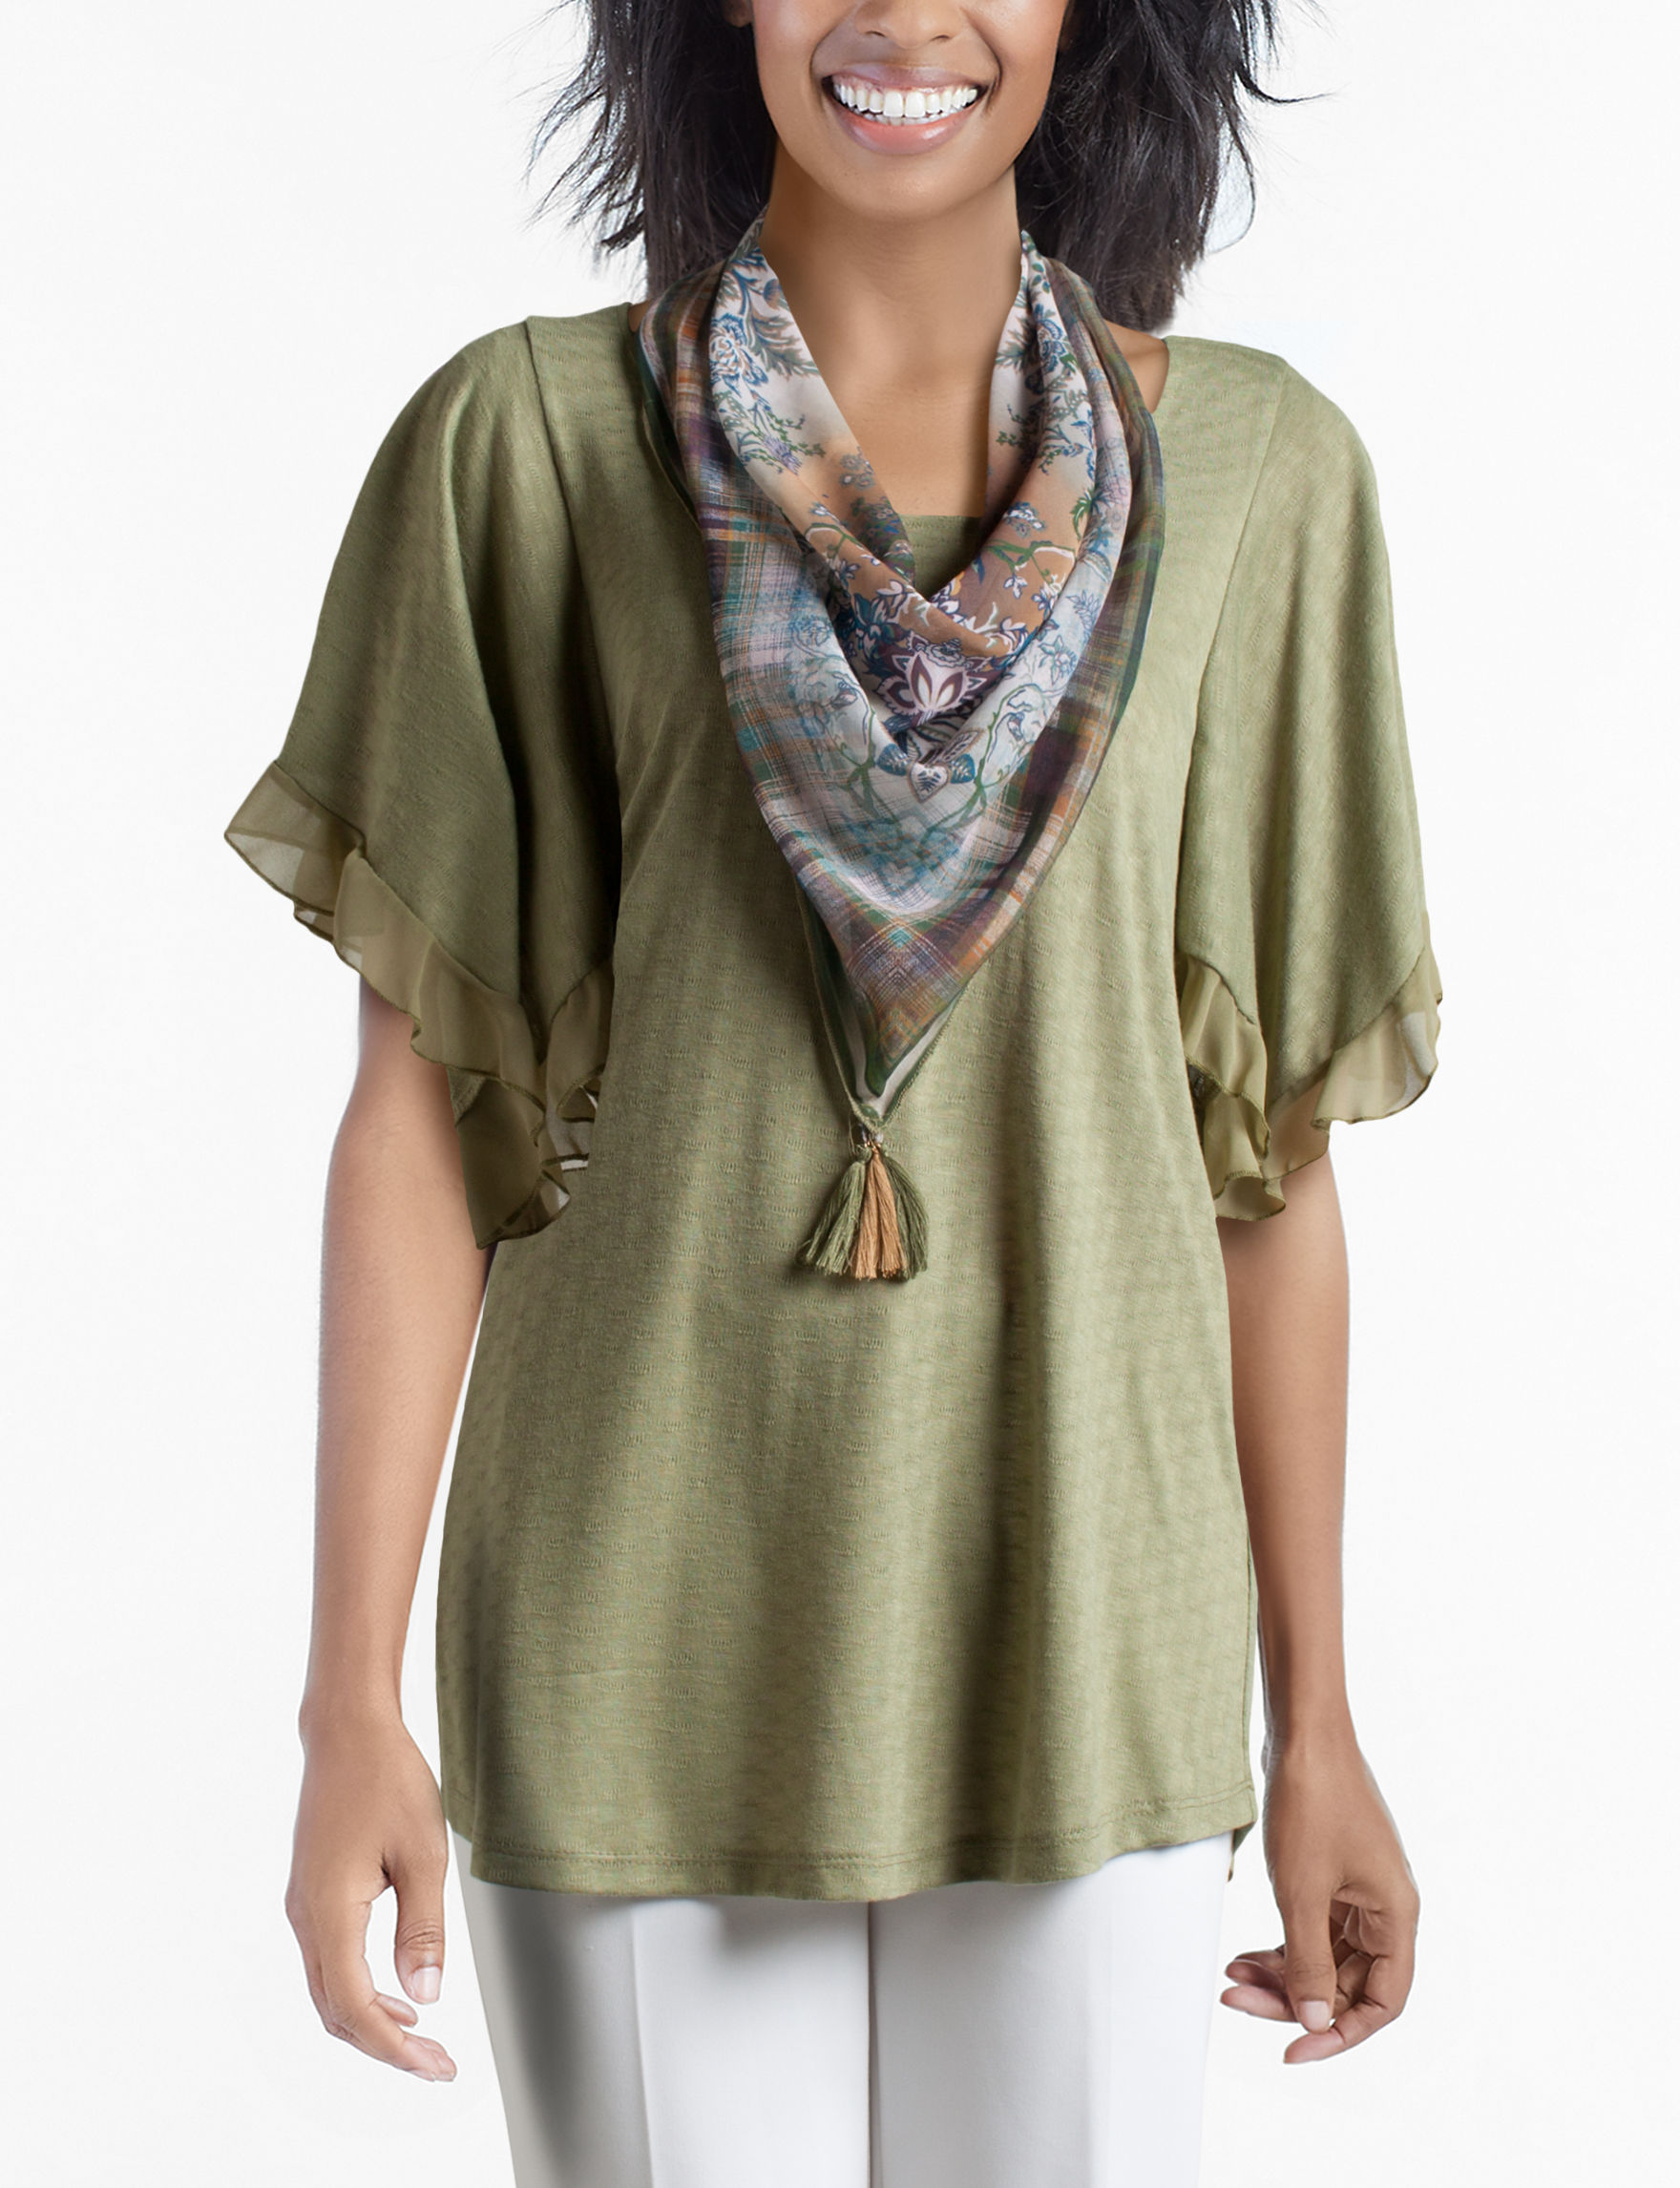 Energe Olive Shirts & Blouses